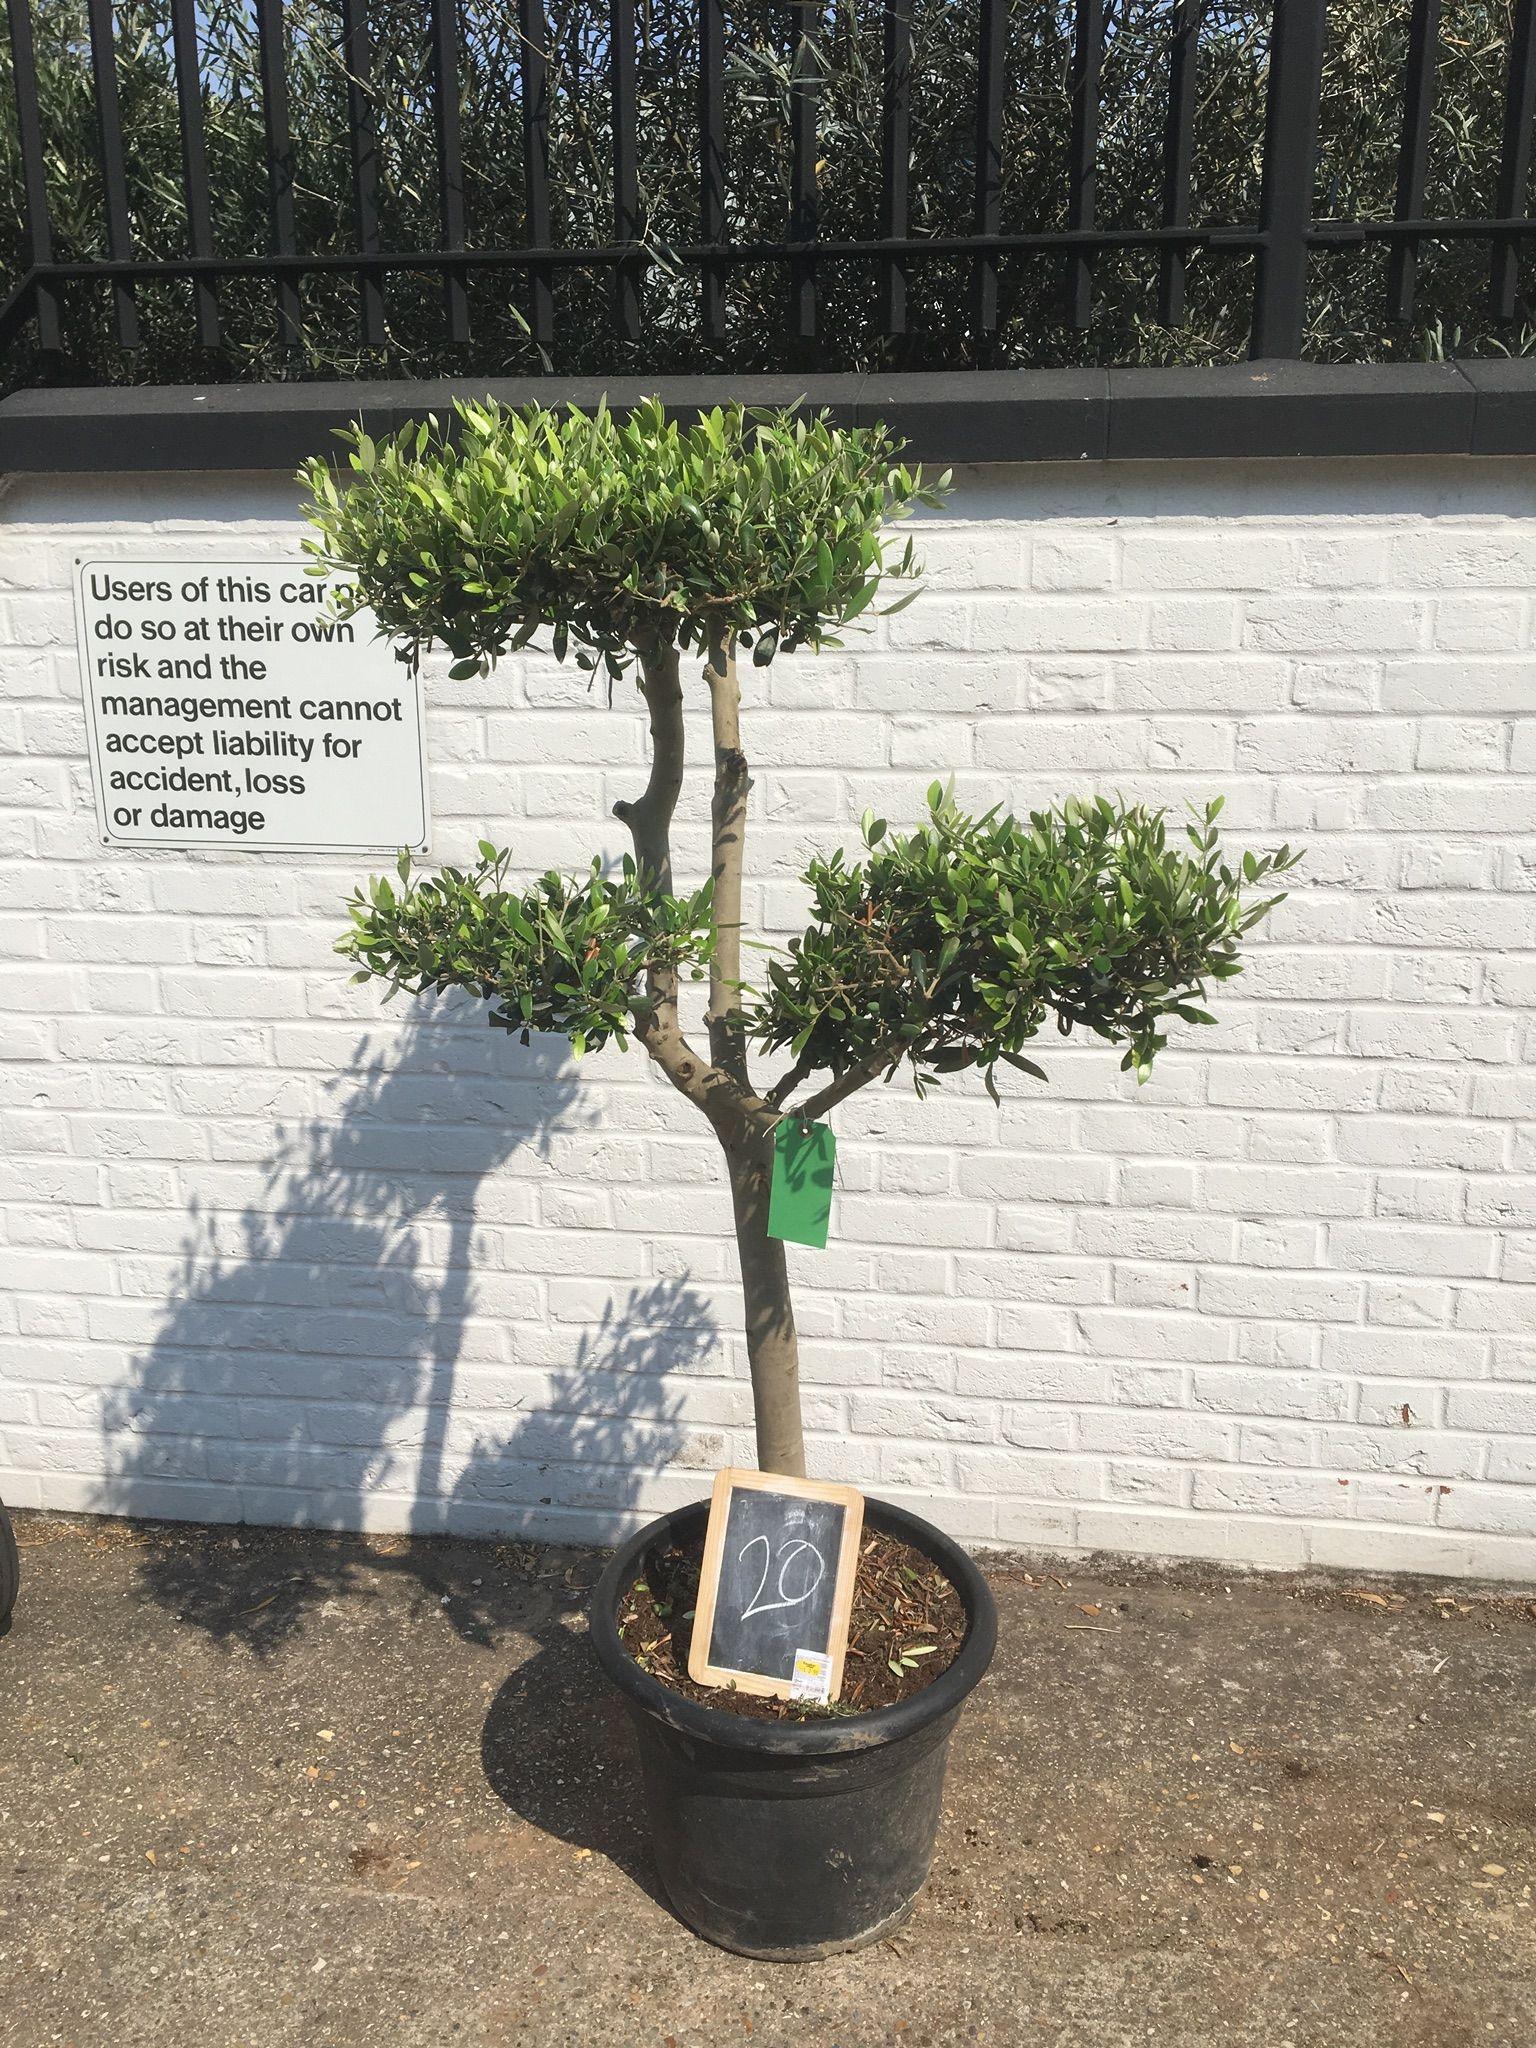 Cloud Pruned Olive Tree For Sale Ornamental And Hardy Pruning Olive Trees Olive Trees For Sale Cloud Pruning